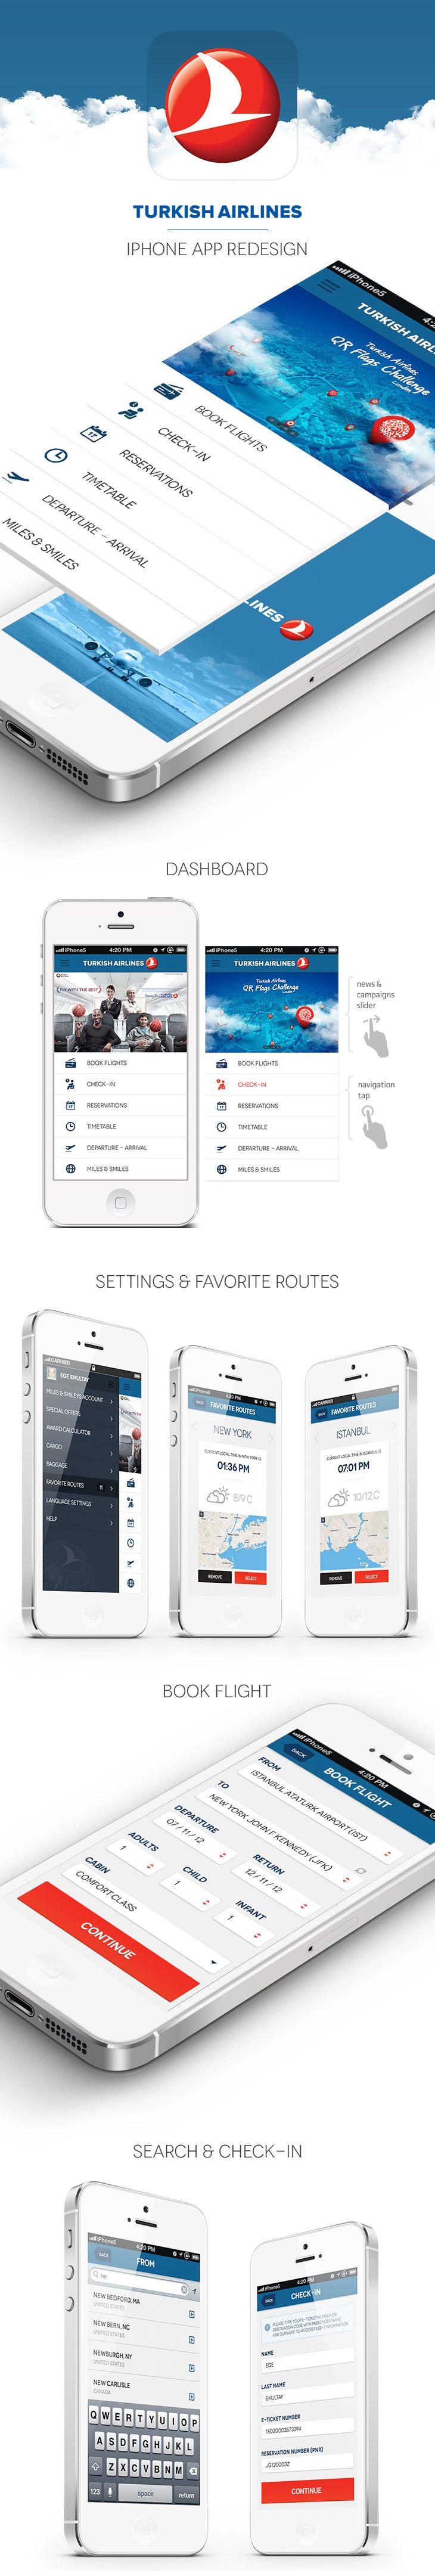 Turkish Airlines - iPhone App Redesign